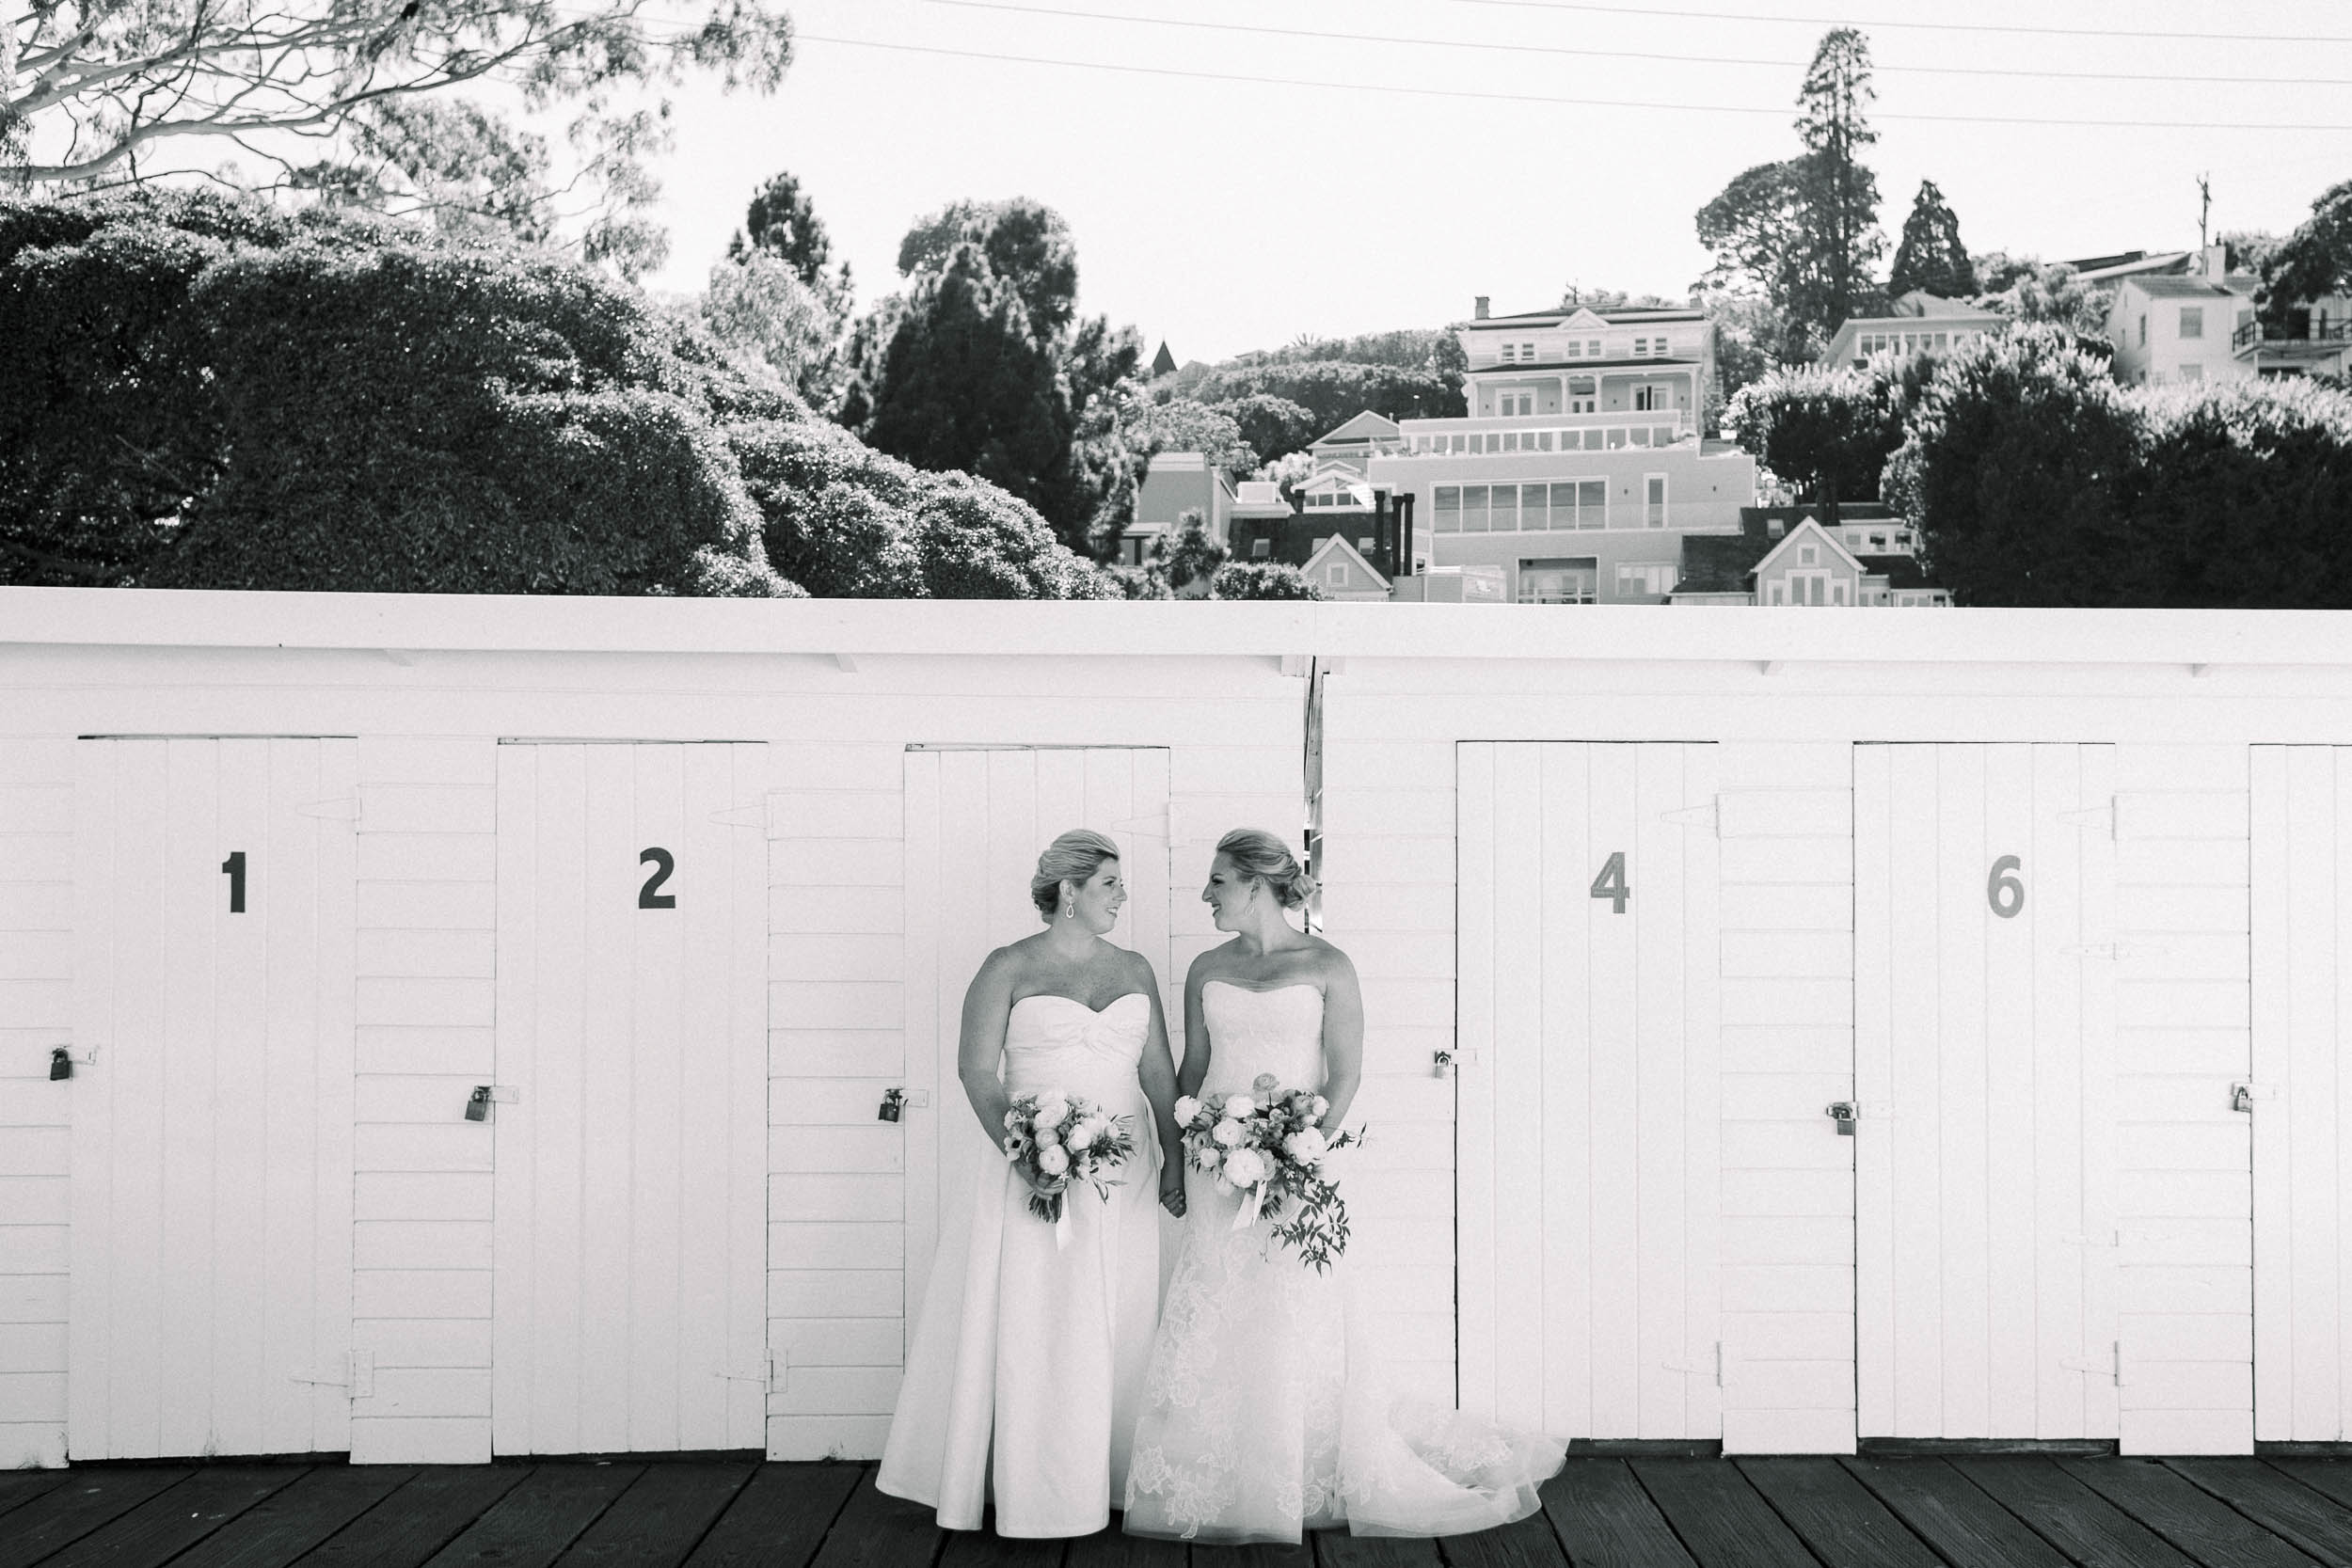 092218ER186_Sausalito Yacht Club Wedding_Buena Lane Photography.jpg